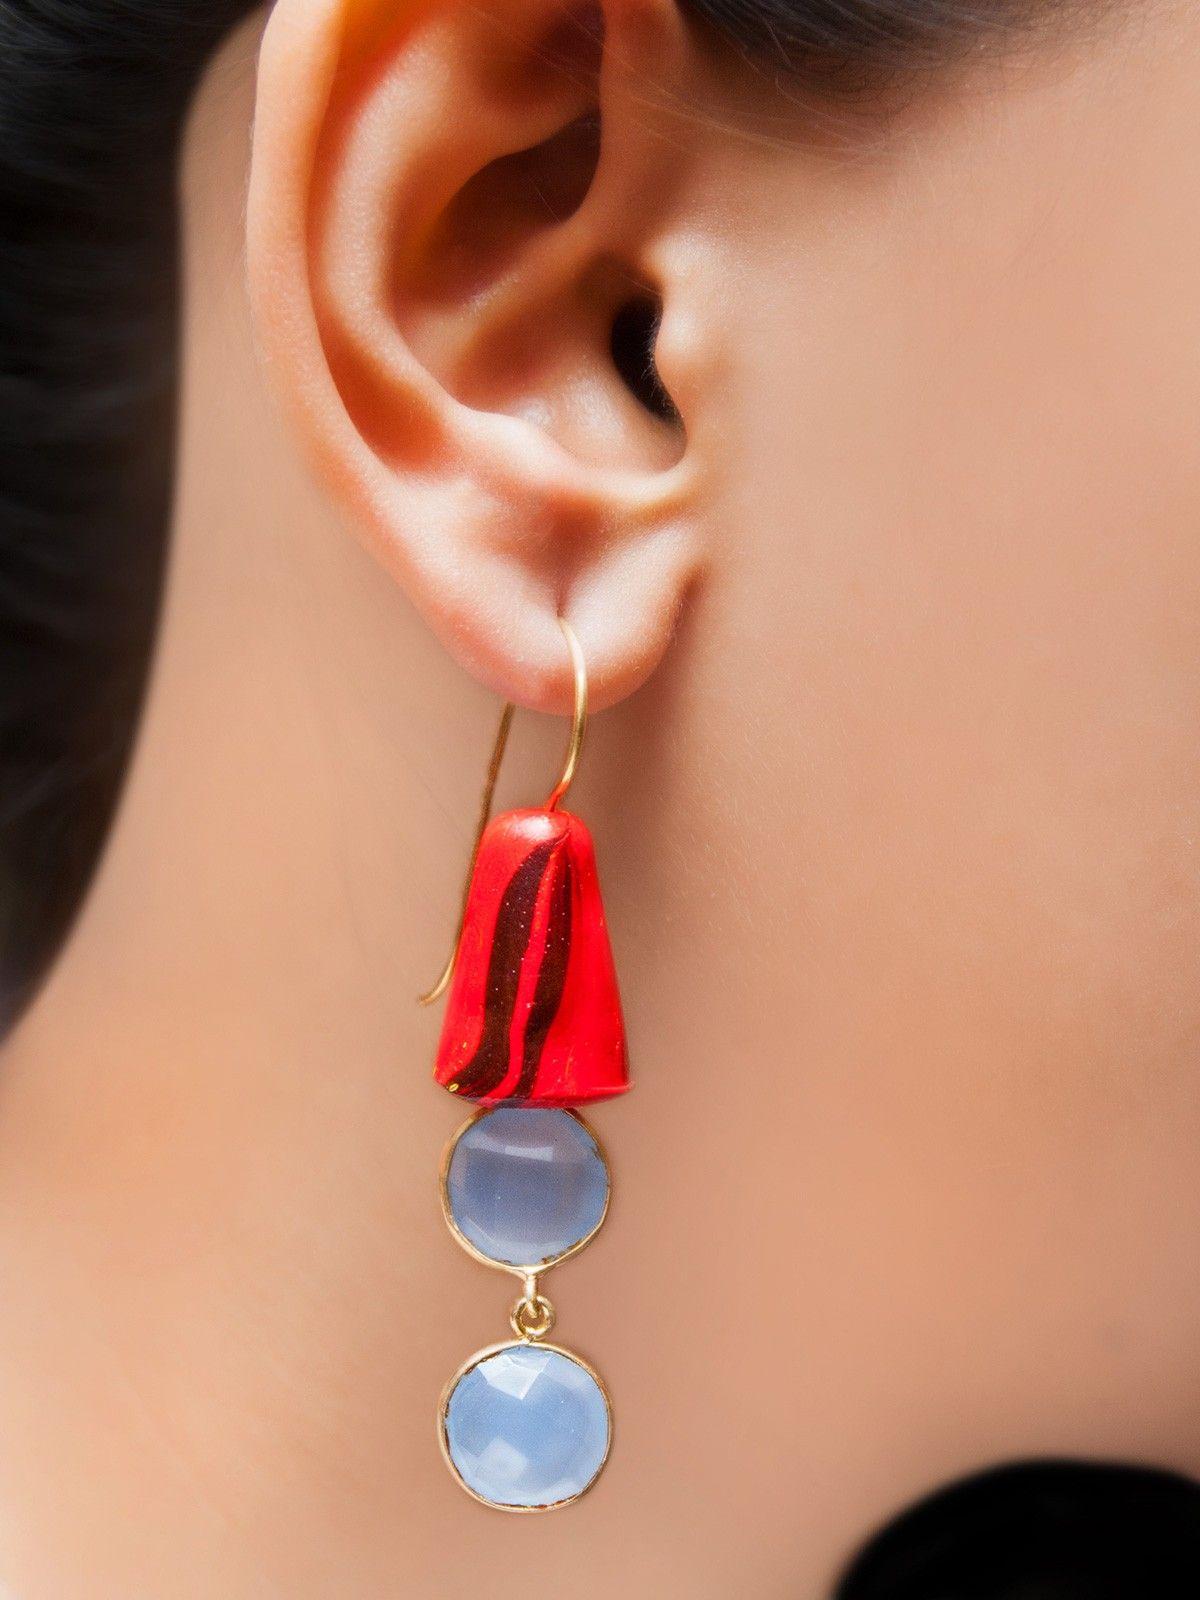 Dawn interstellar earrings